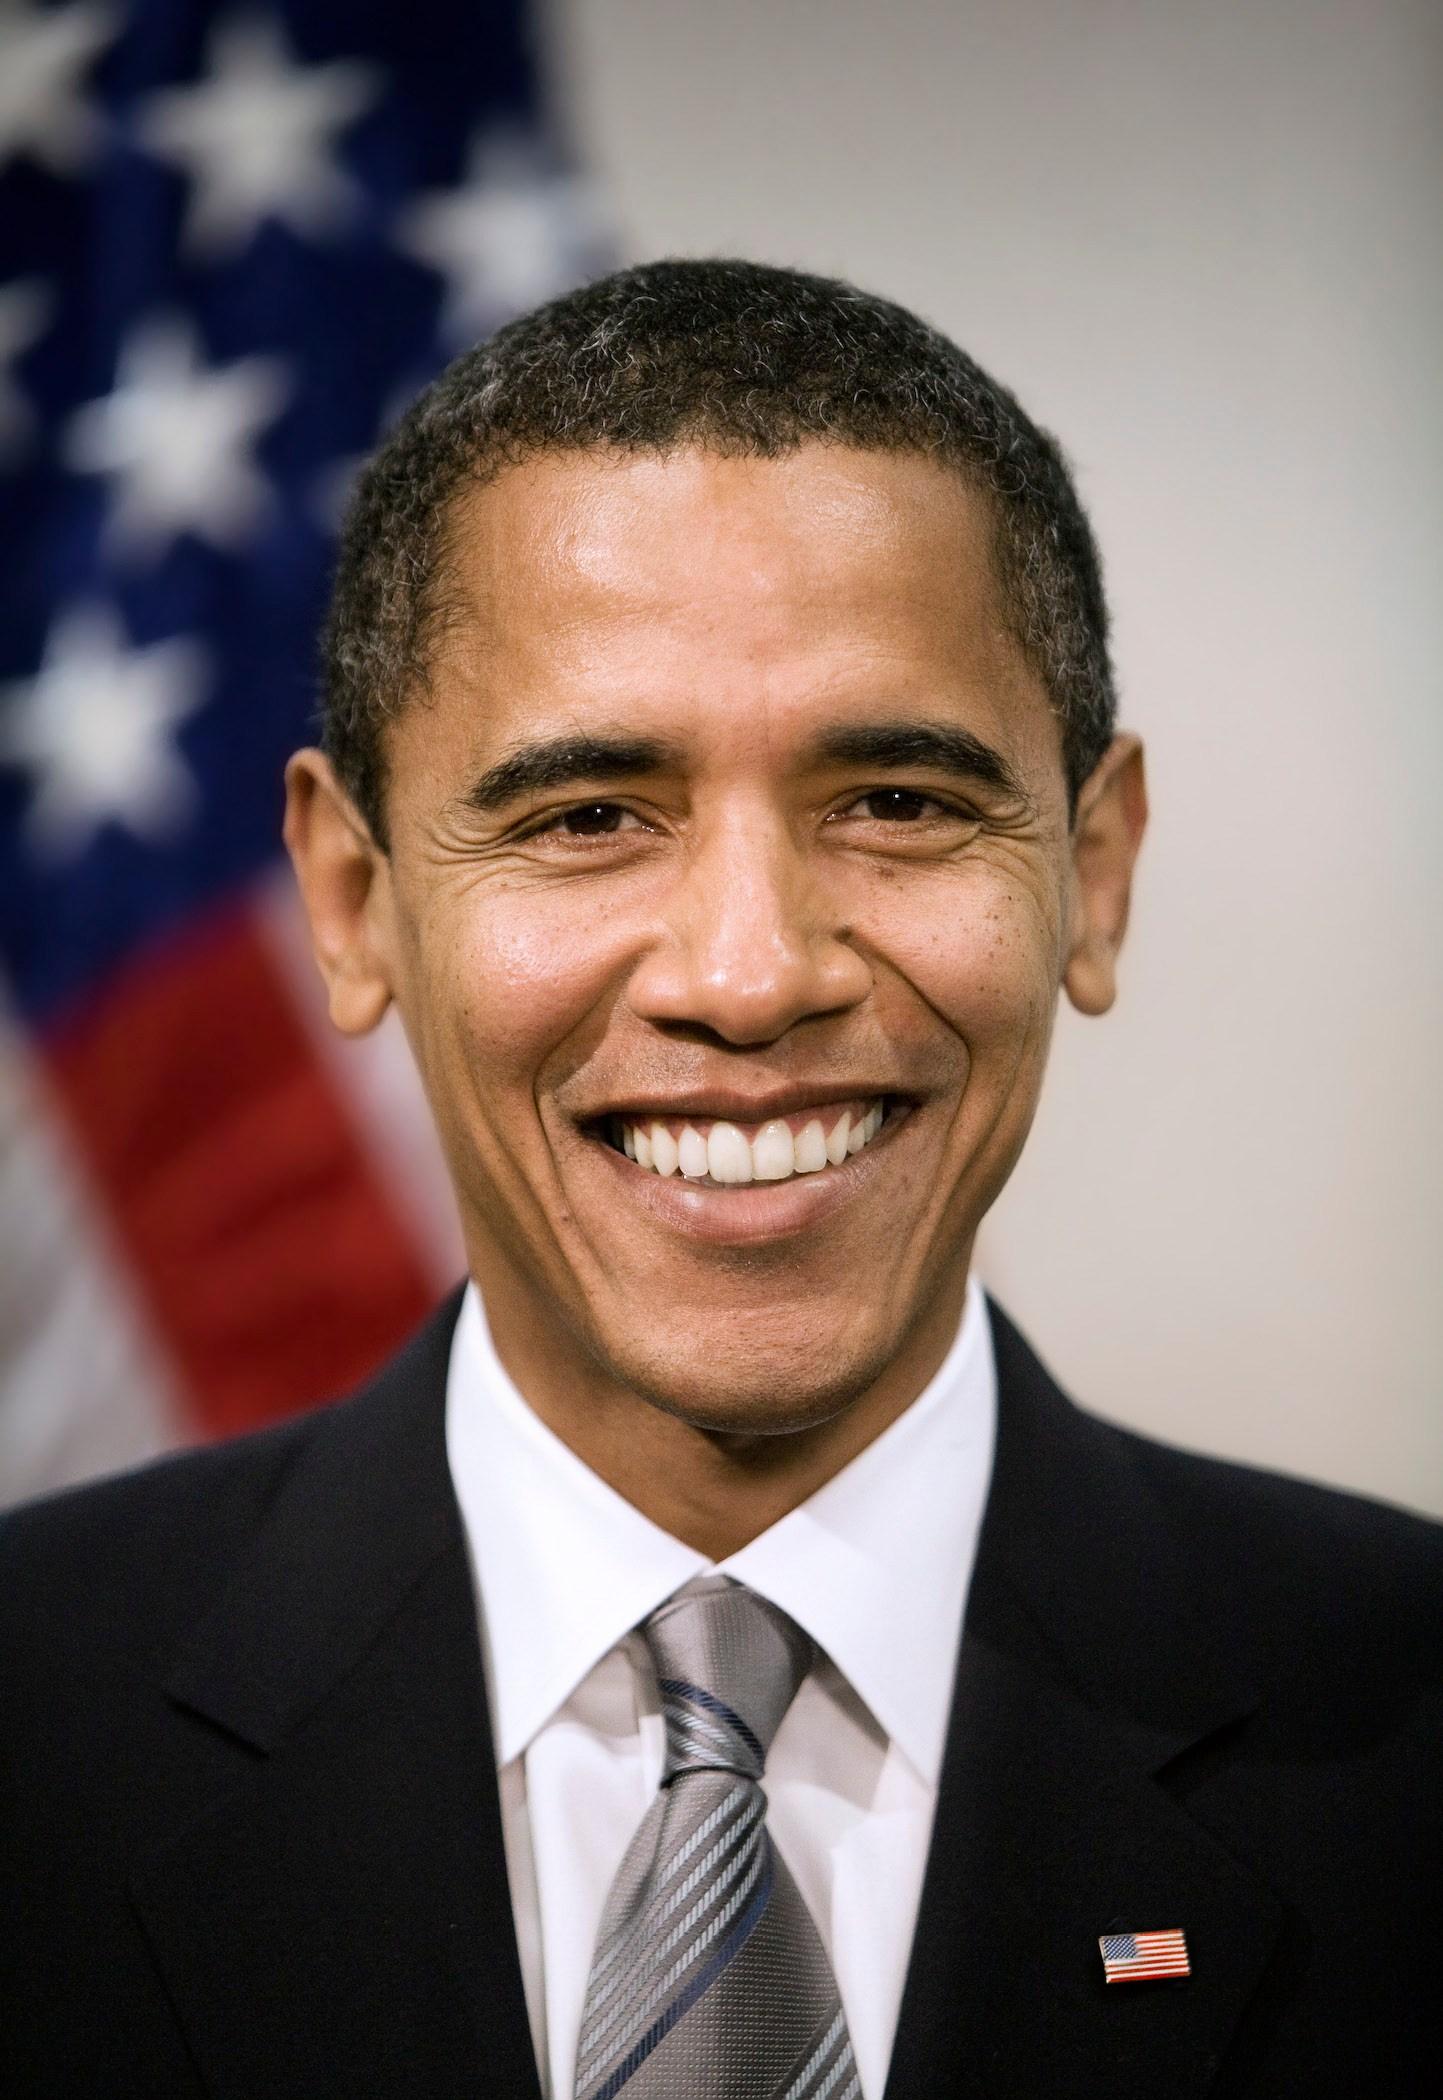 Obama Big Smile